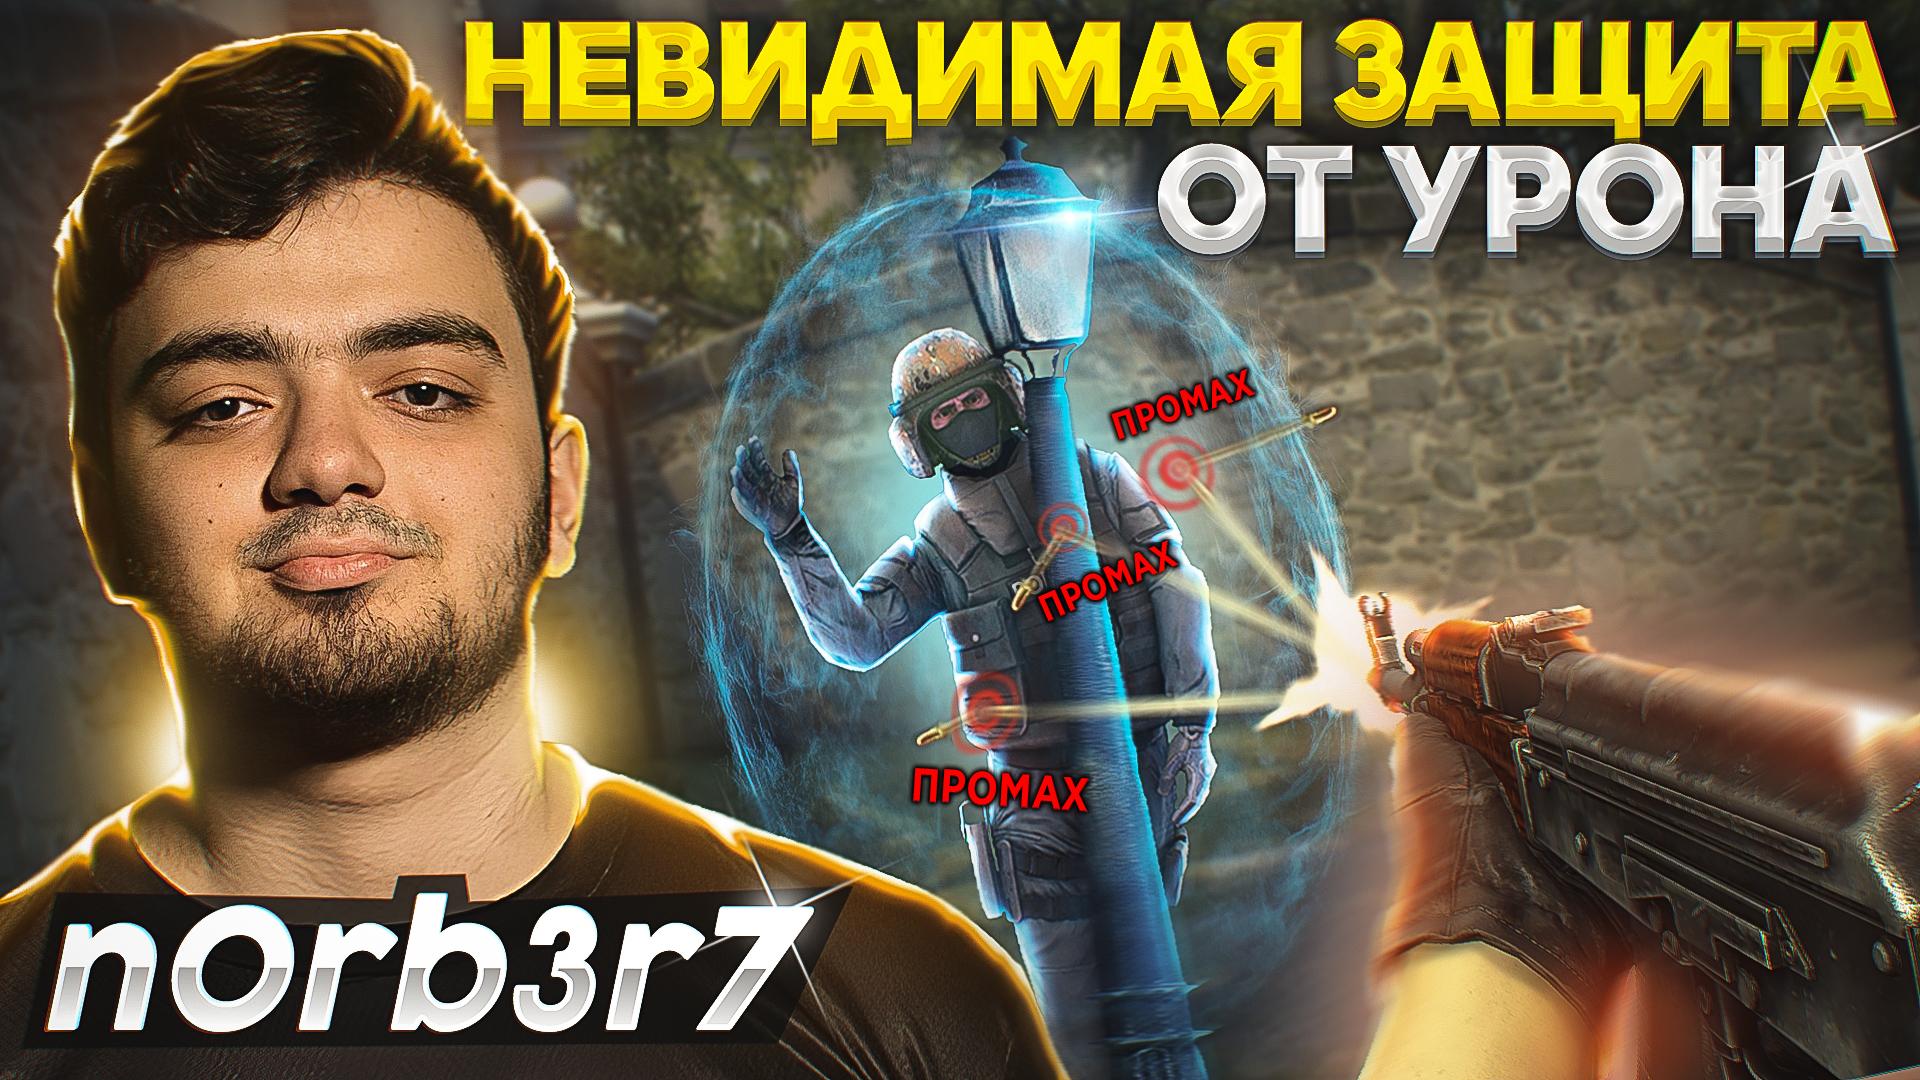 Александр «Petr1k» Петрик, Гайды по CS:GO, Давид «n0rb3r7» Даниелян